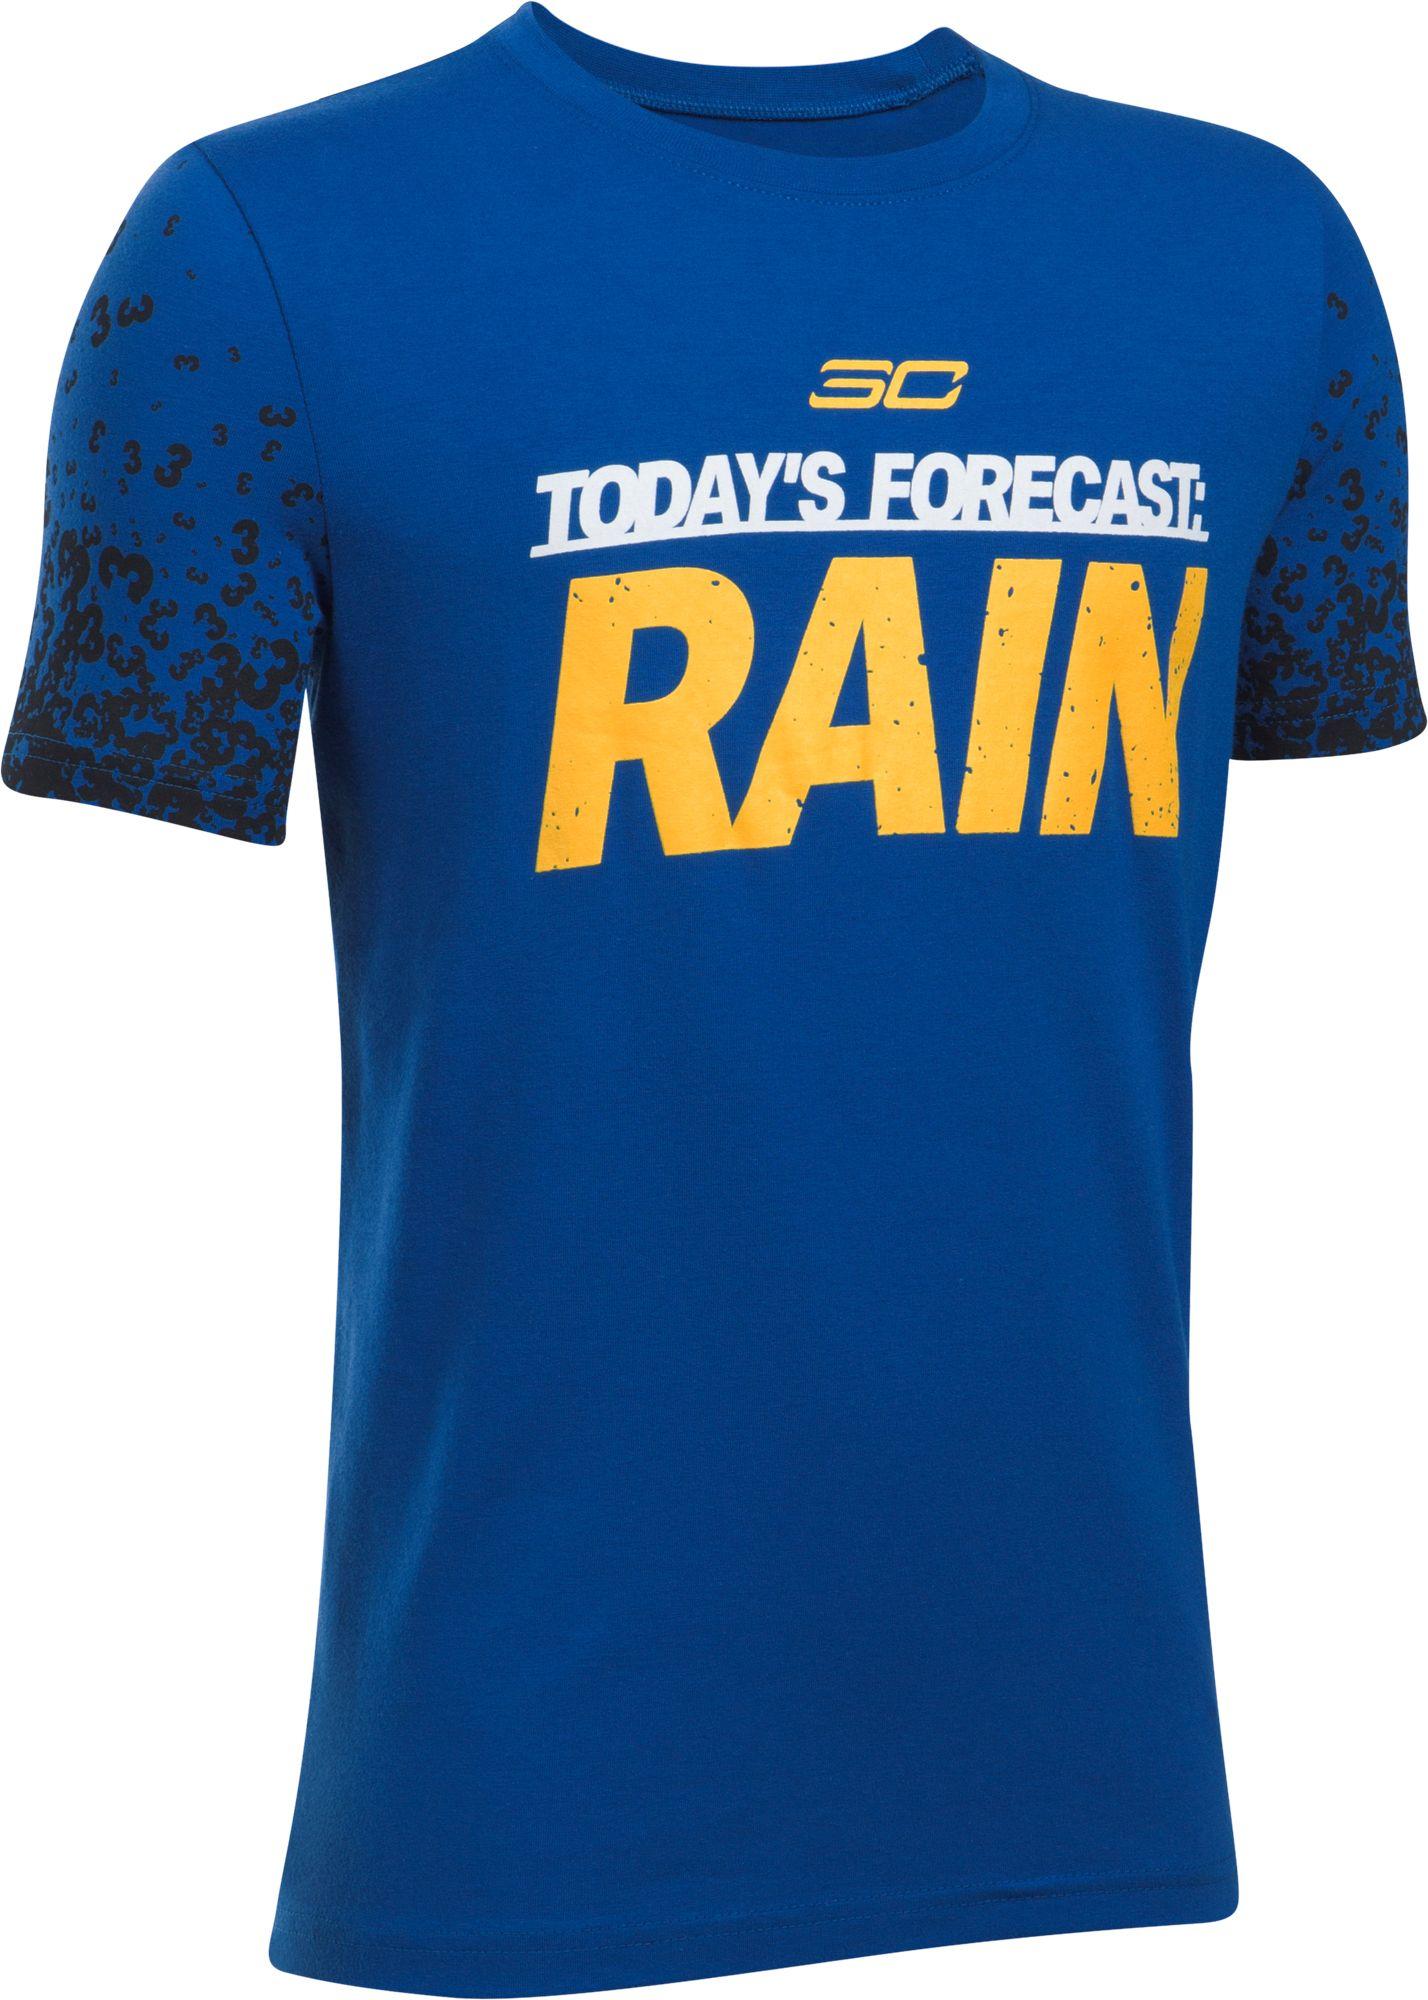 Under Armour Boys' SC30 Forecast Rain Graphic Basketball T-Shirt ...